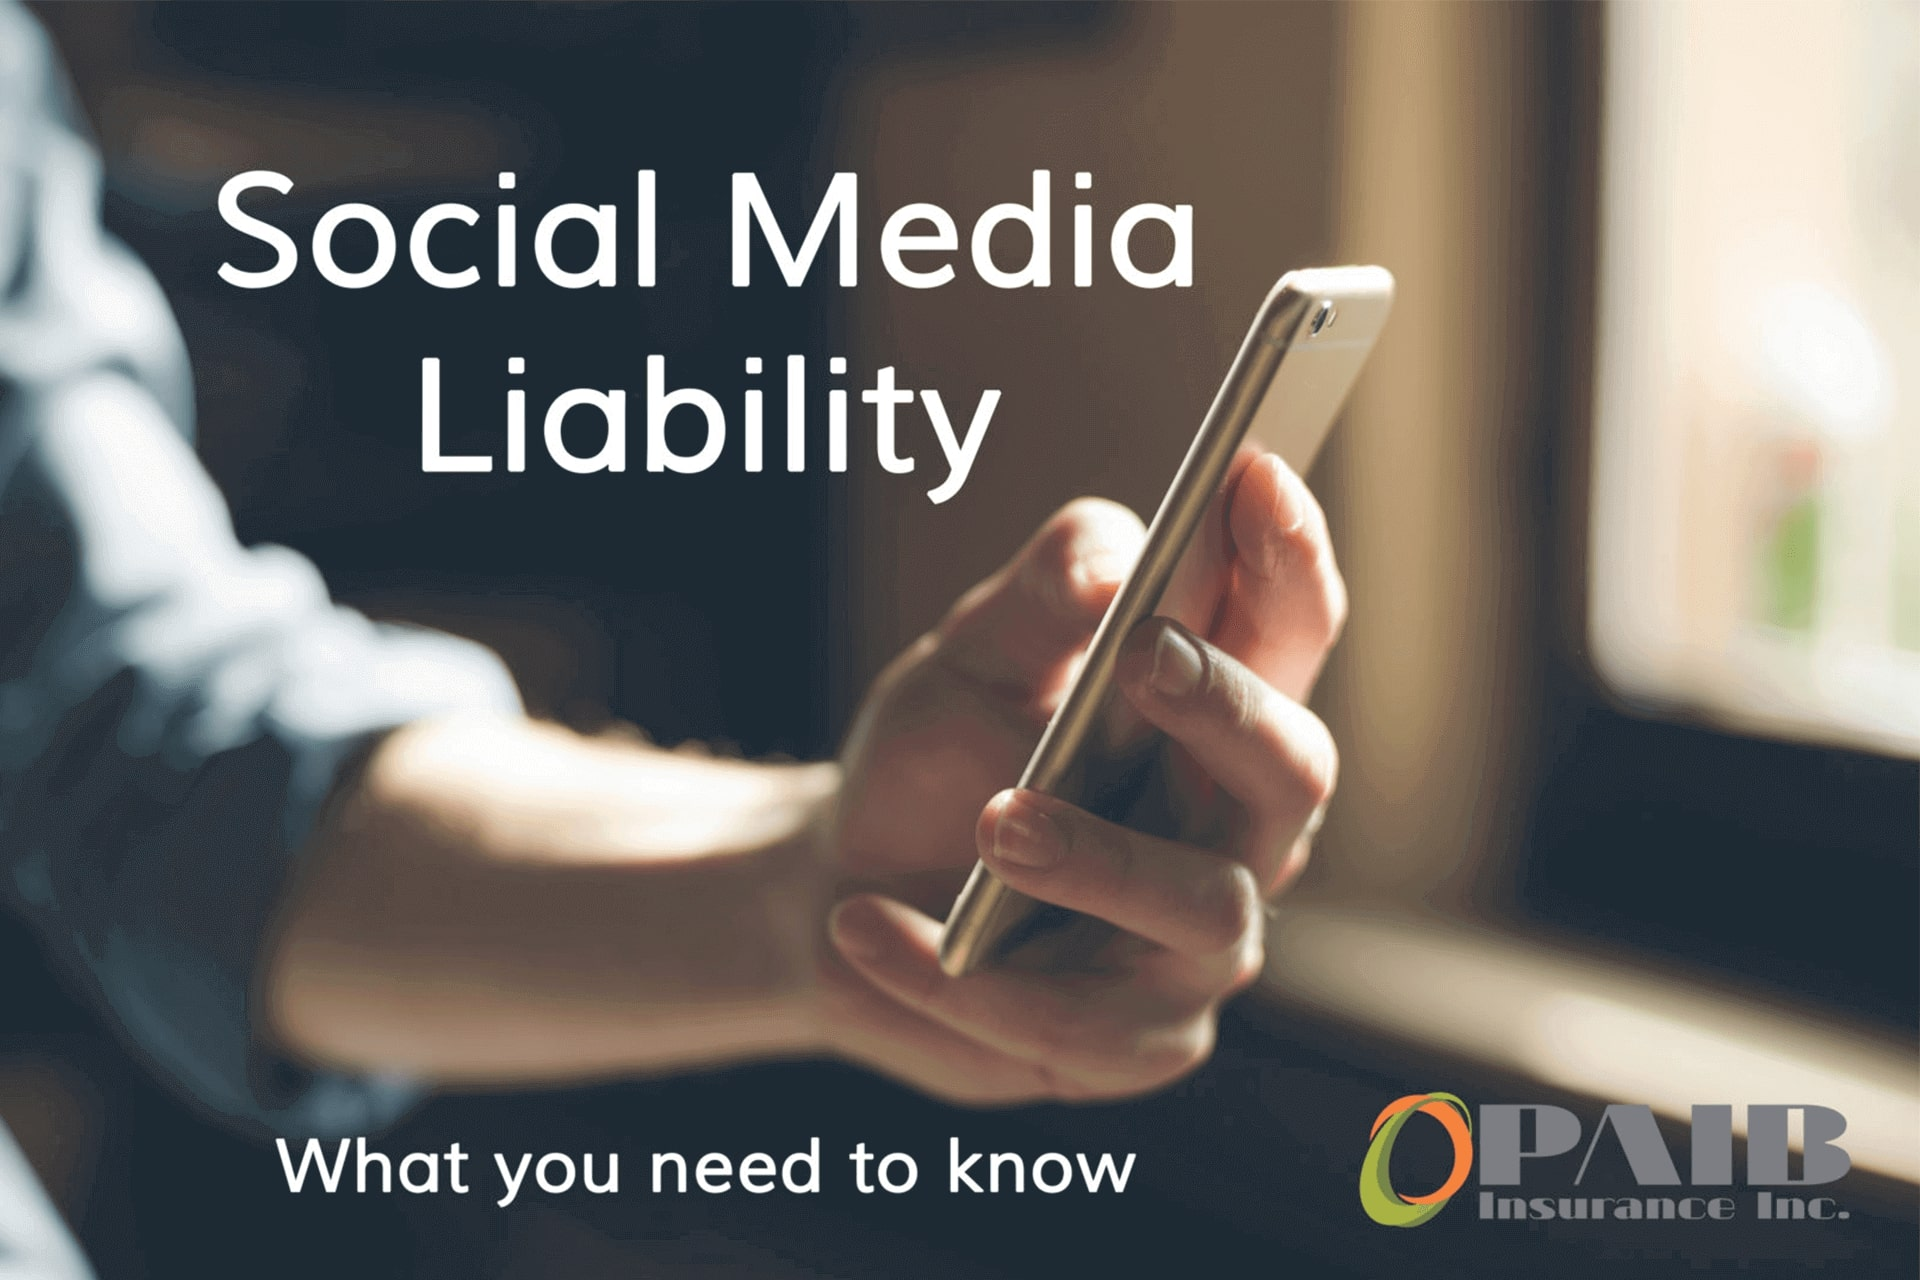 Social Media Liability - PAIB Insurance